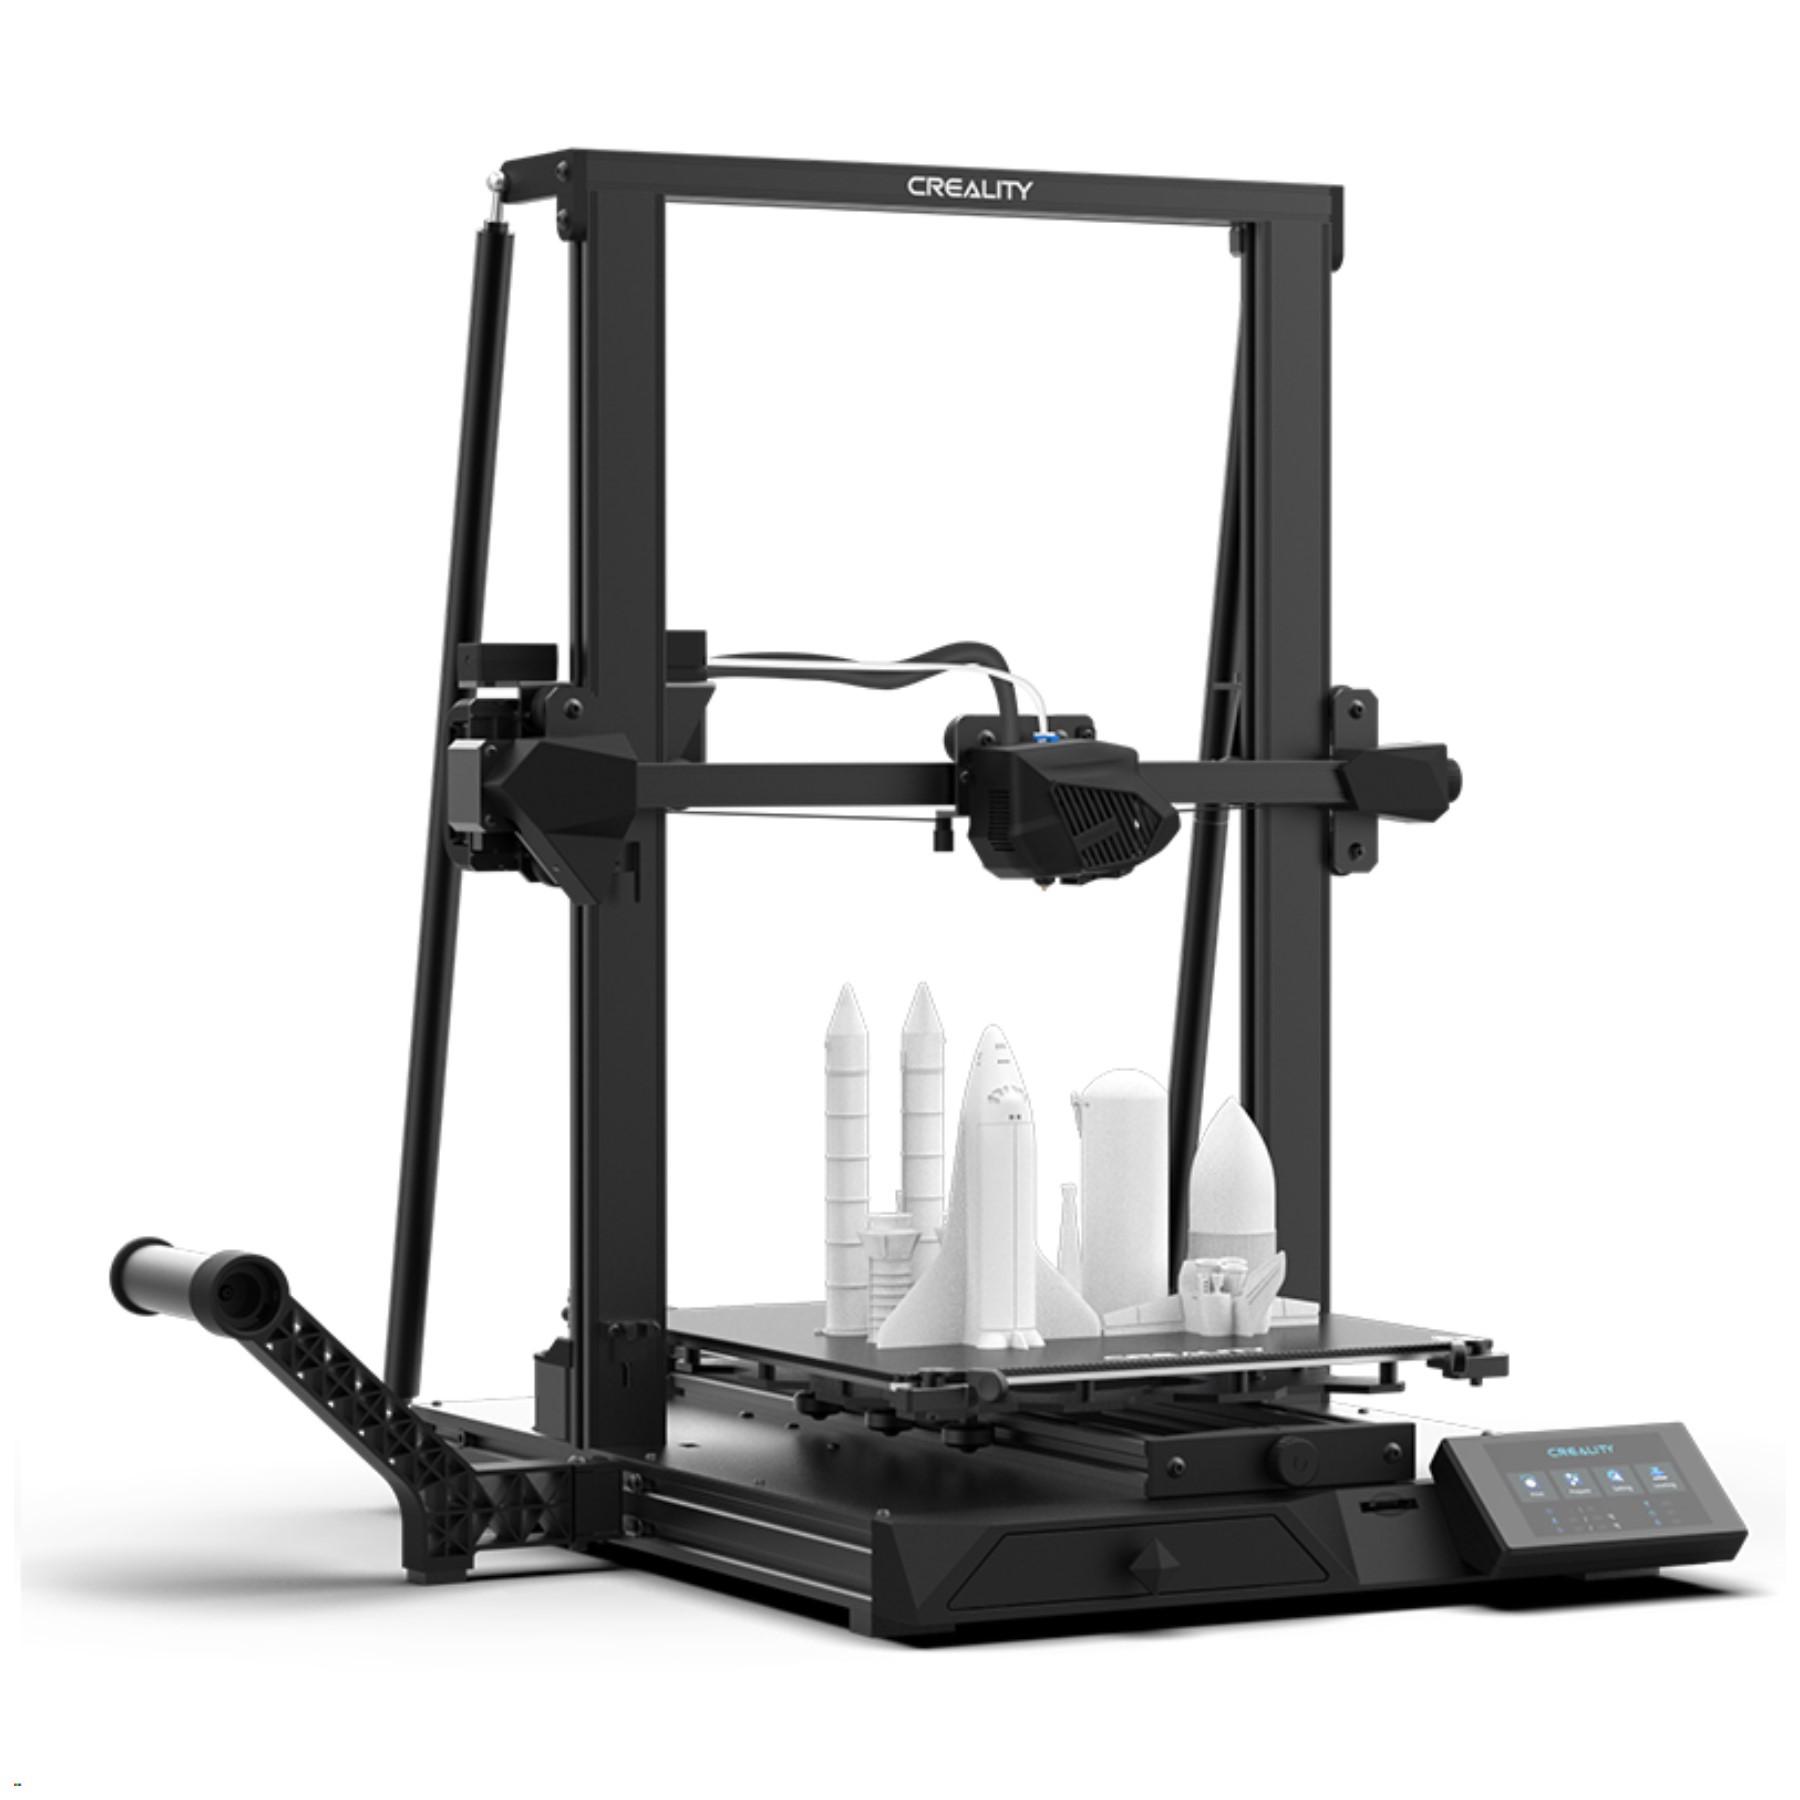 Impresora 3D CR-10 Smart